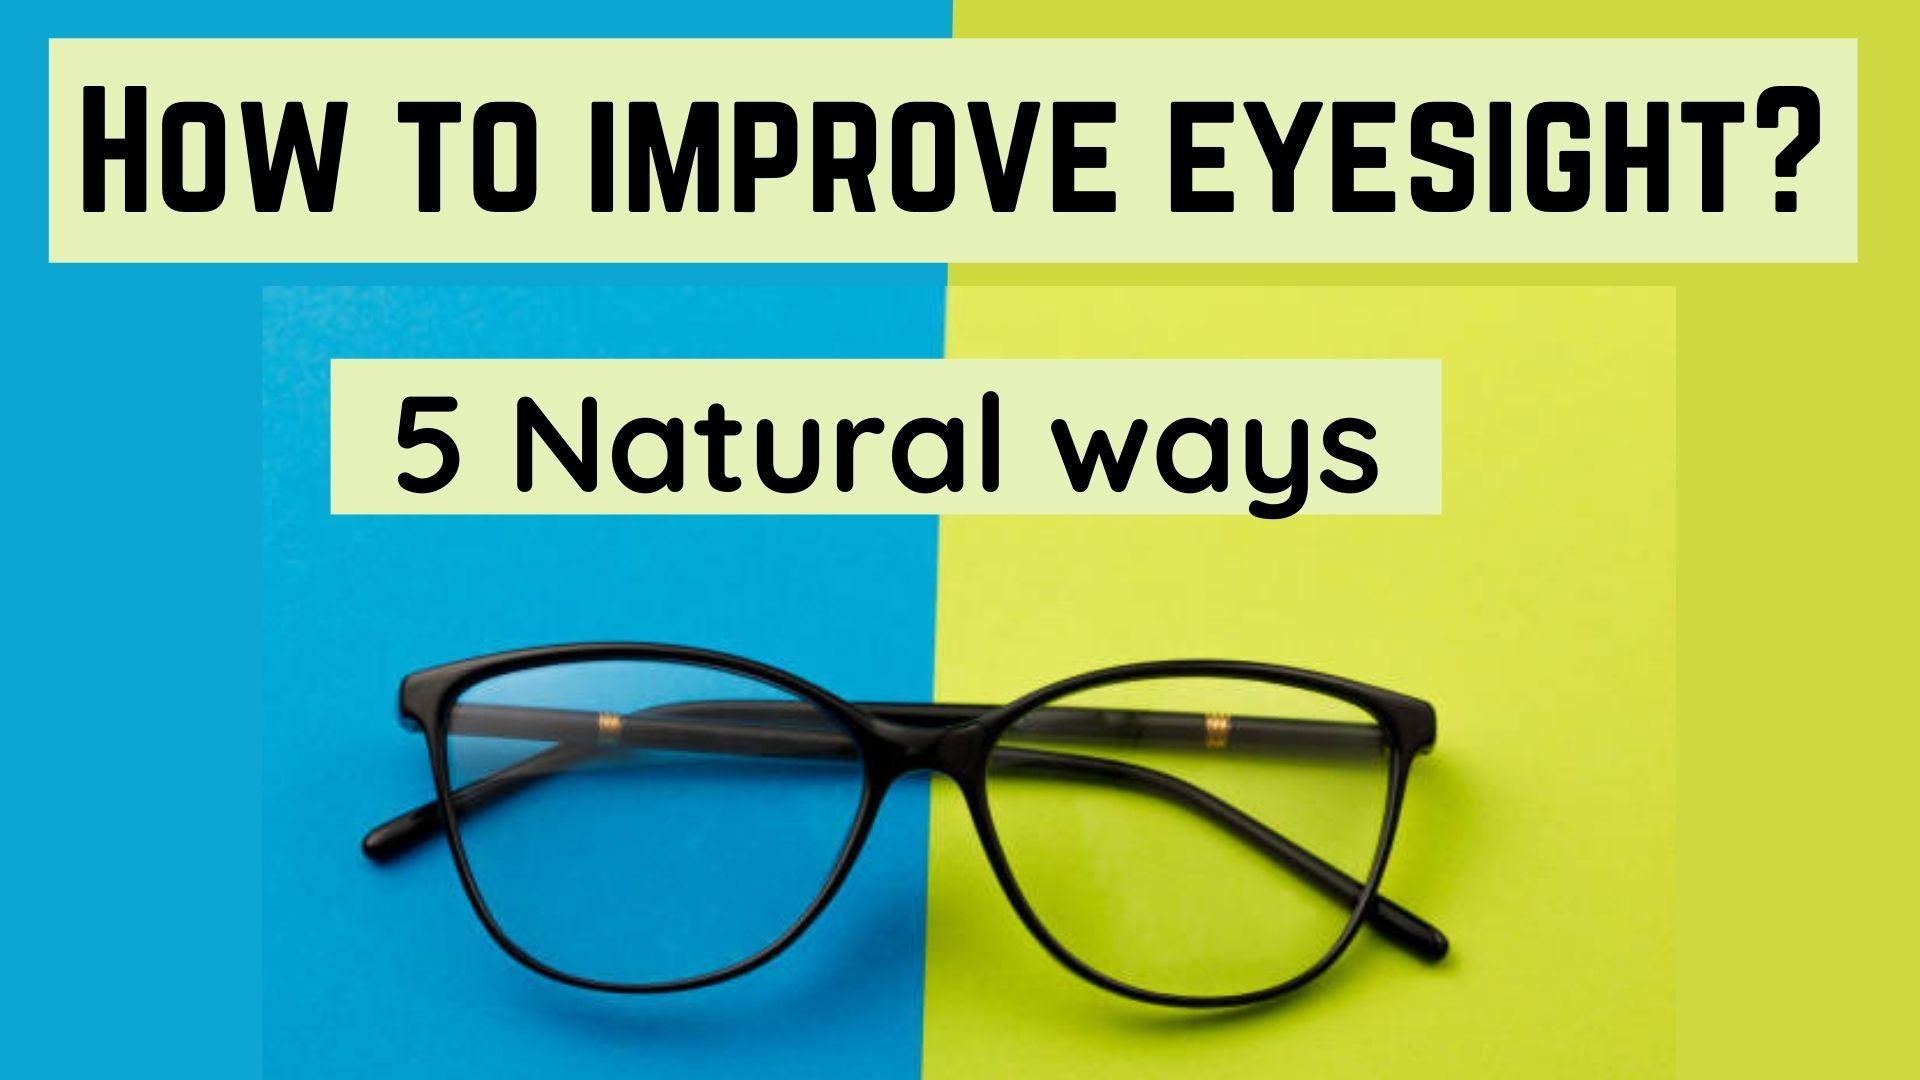 how to improve eyesight?